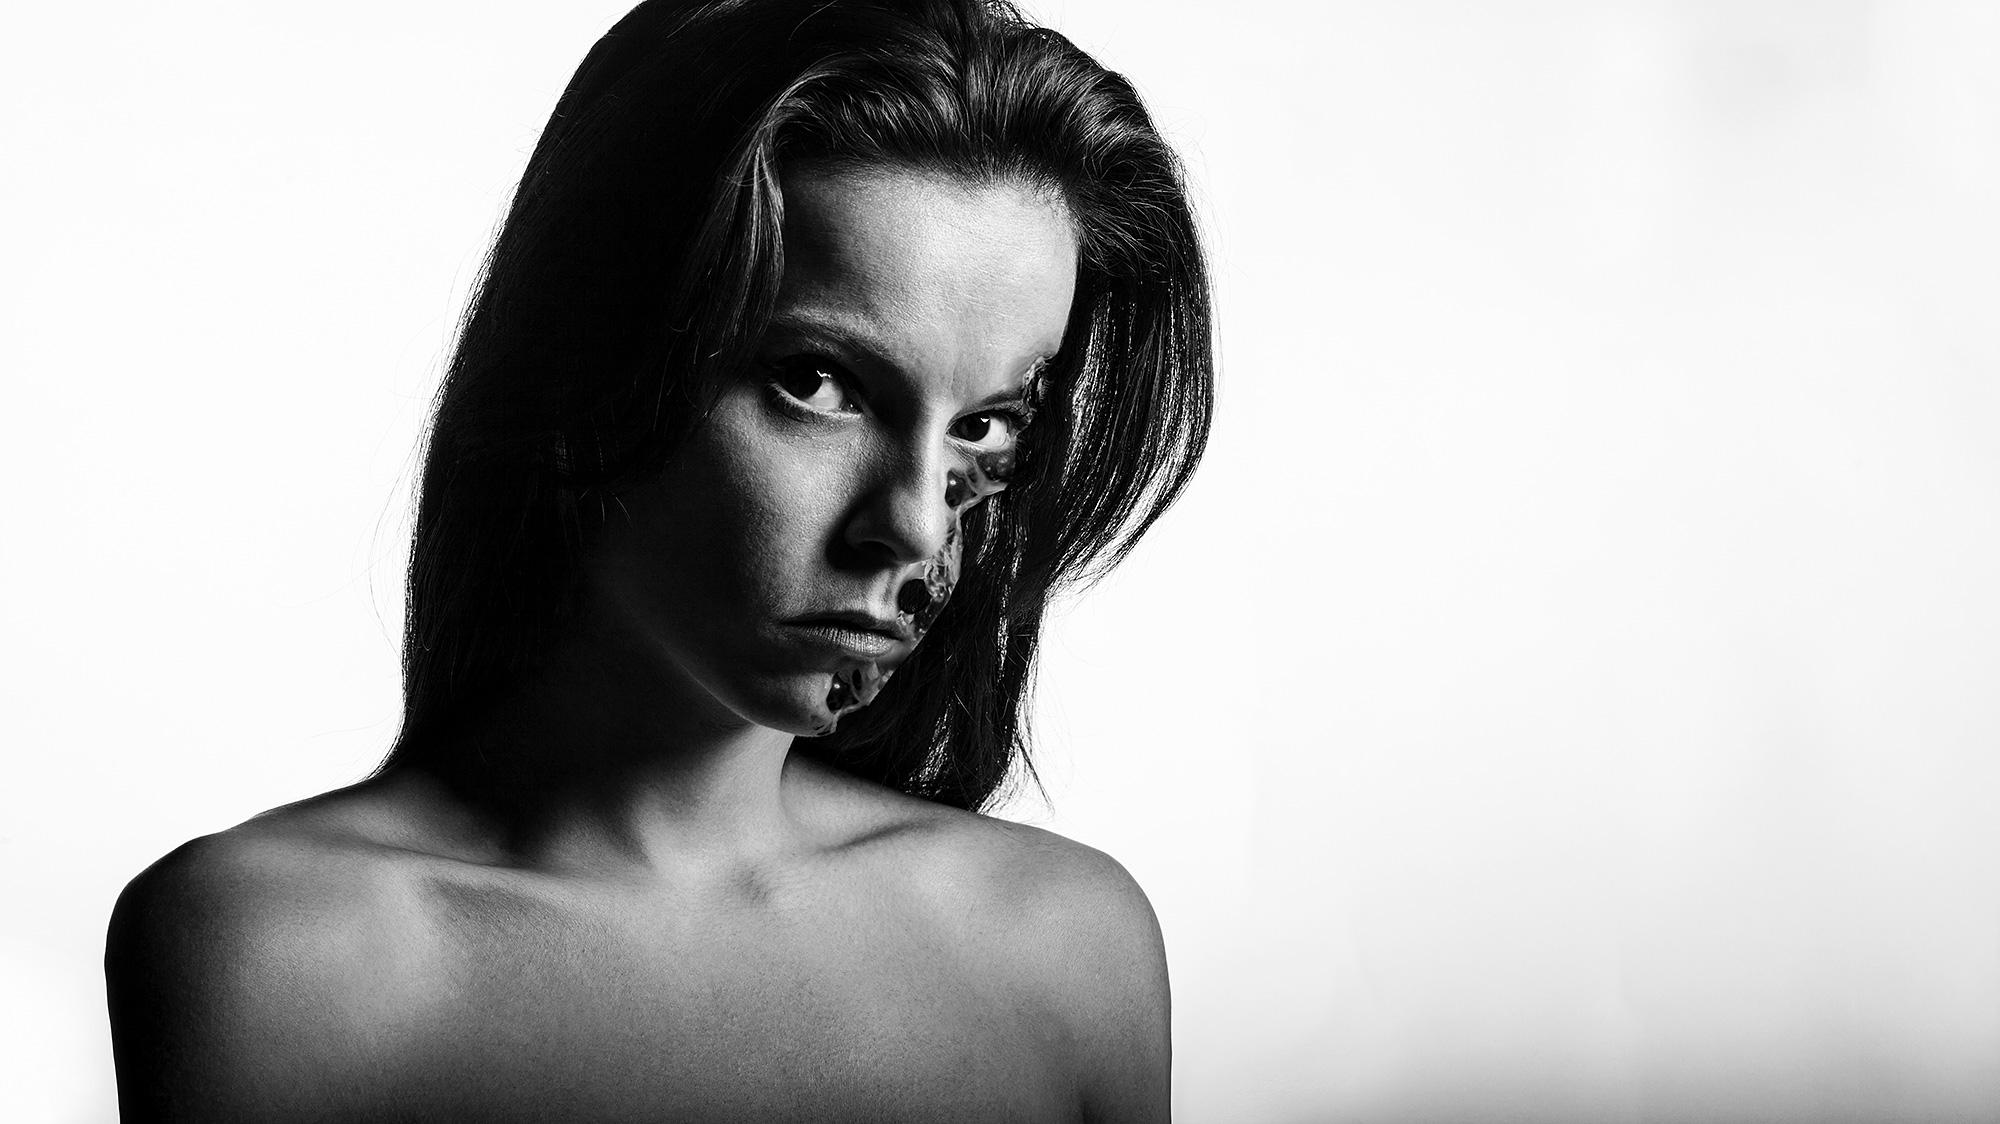 Martin Geisler Groteske Photography